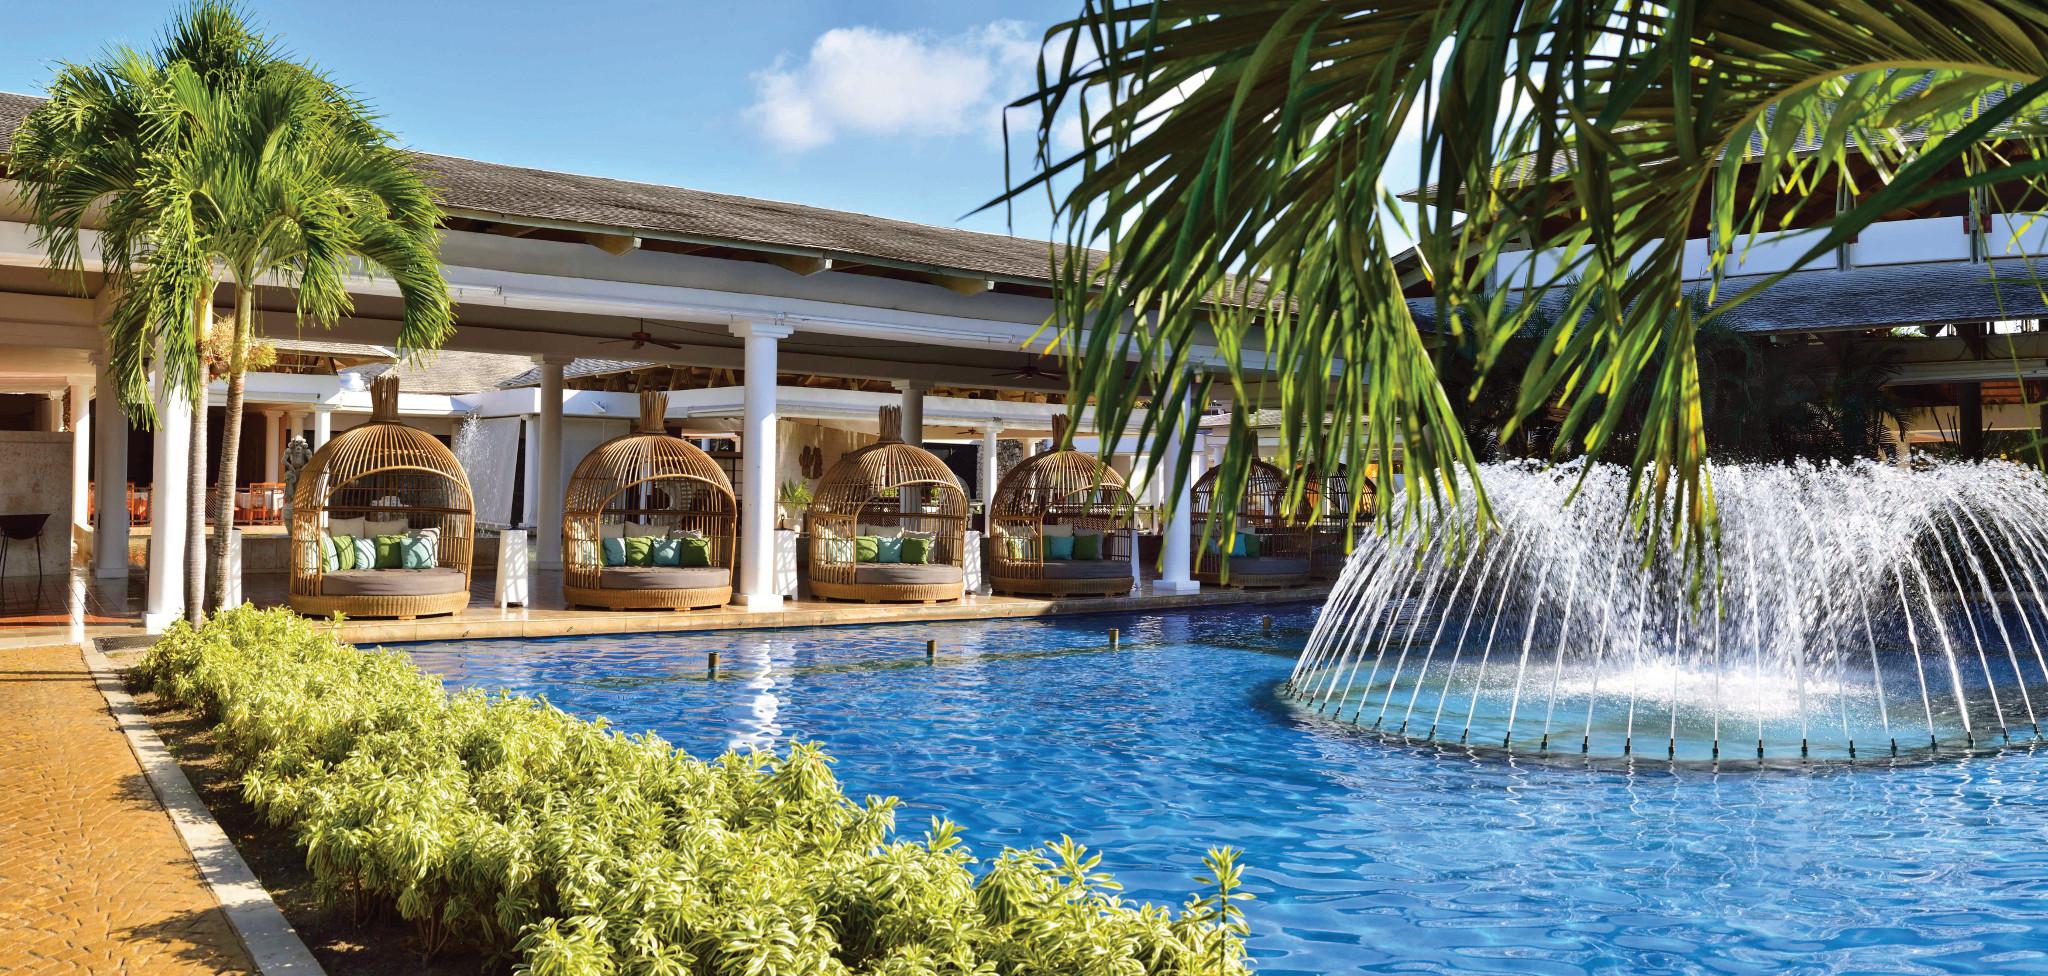 Bavaro beach resort casino & spa ky internet gambling